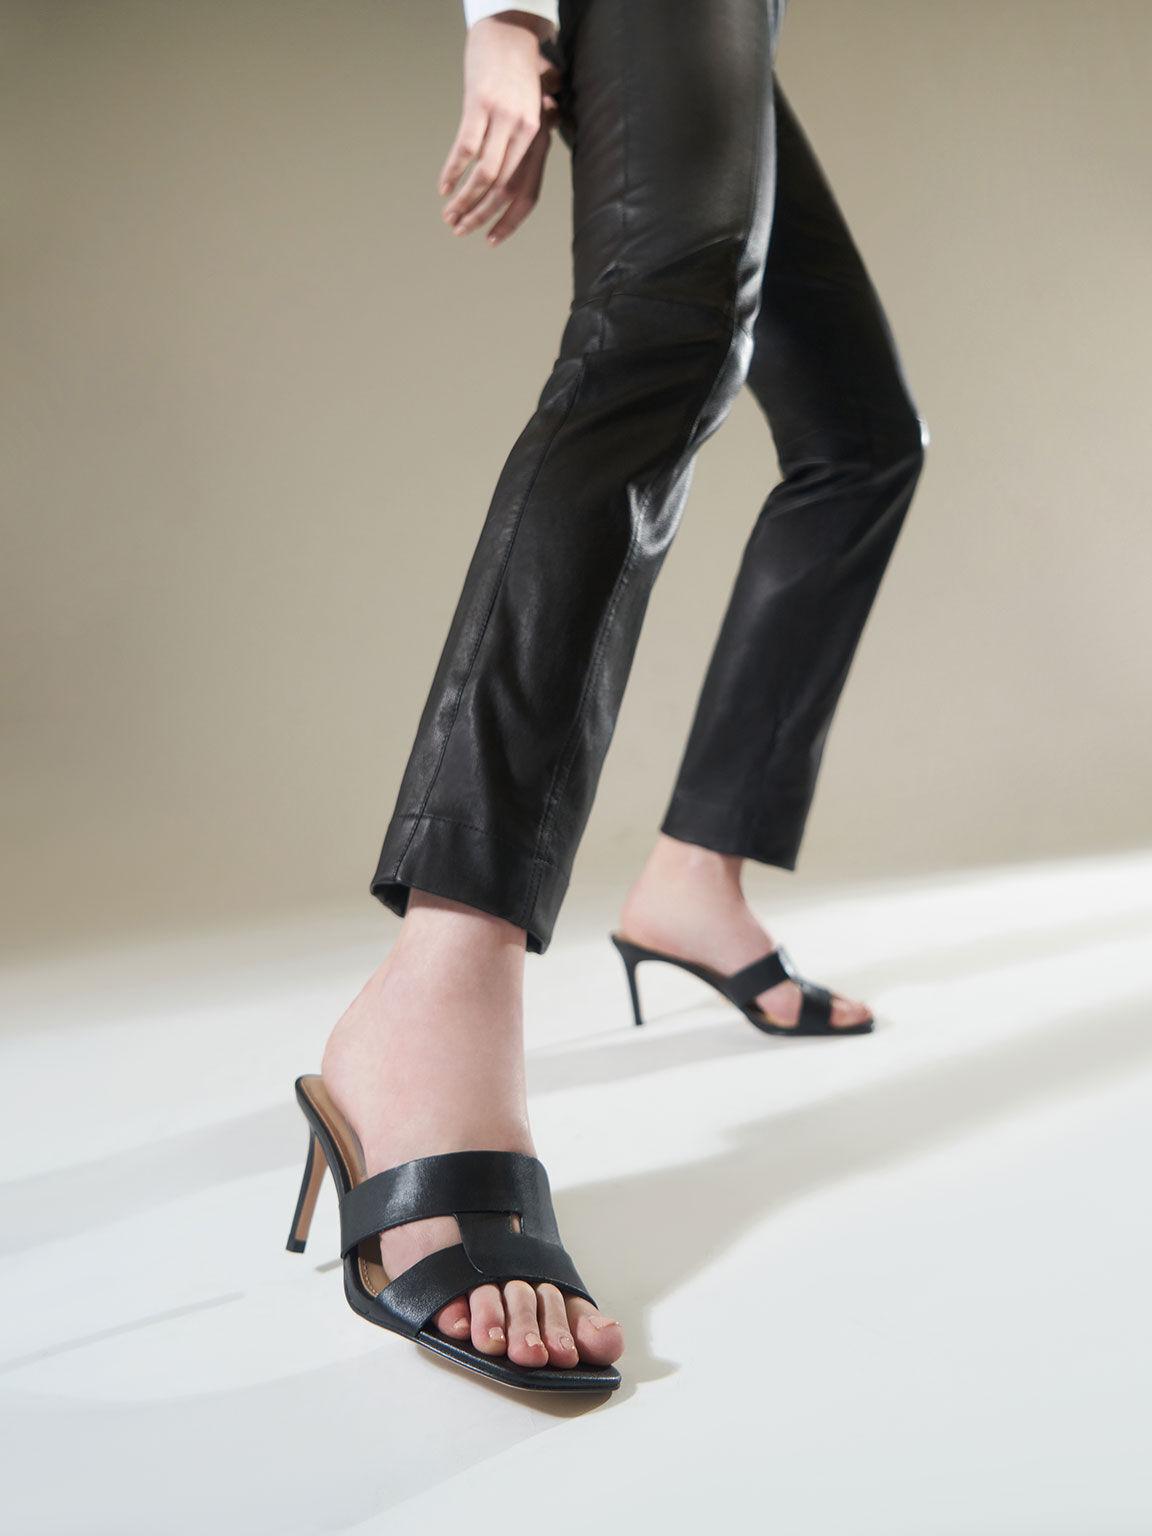 Leather Cut-Out Stiletto Mules, Black, hi-res